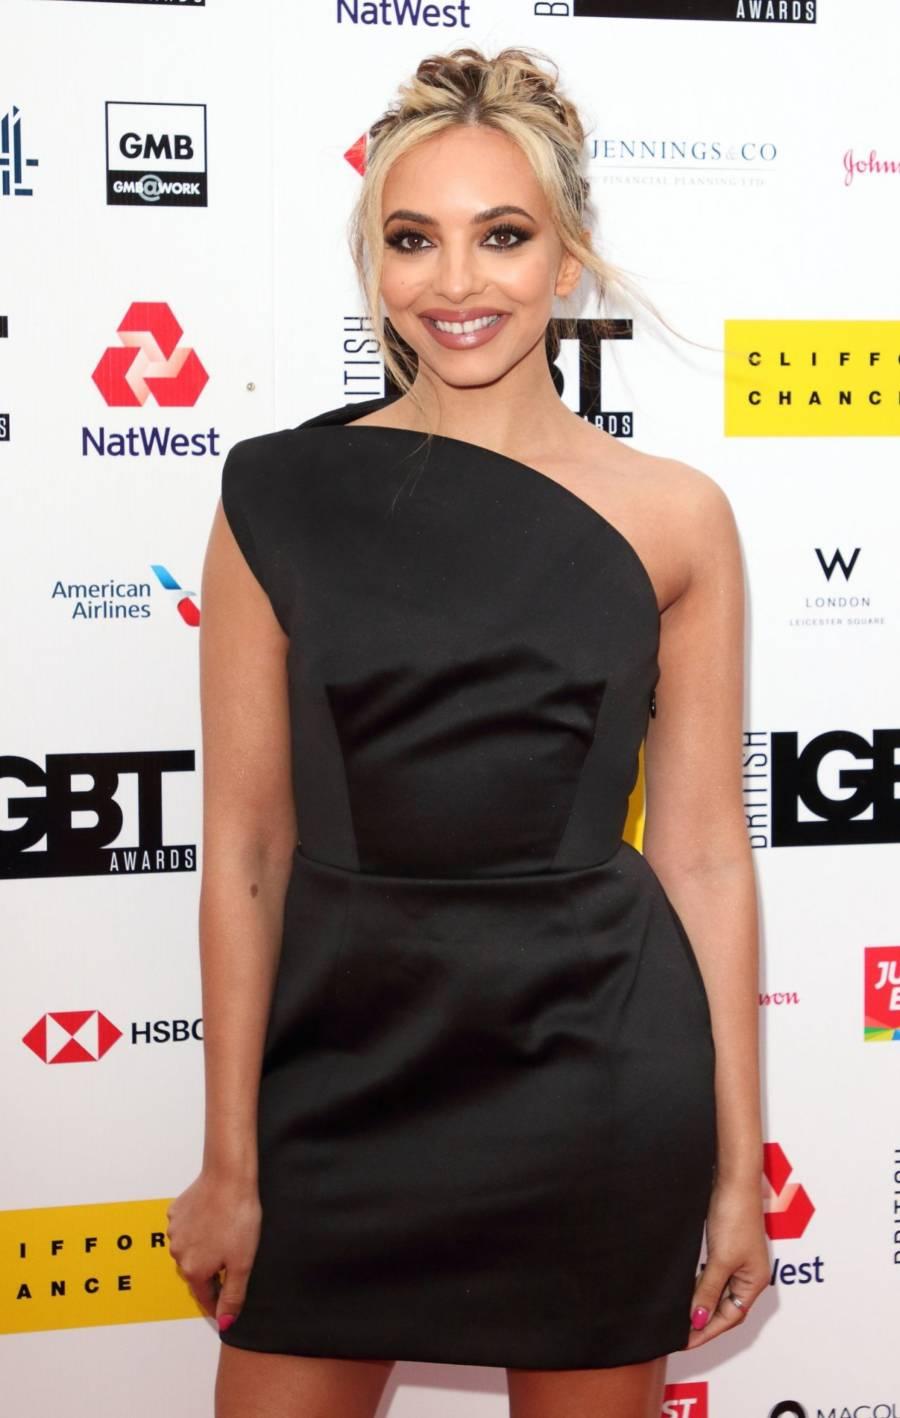 English Singer Jade Thirlwall At LGBT Awards in London